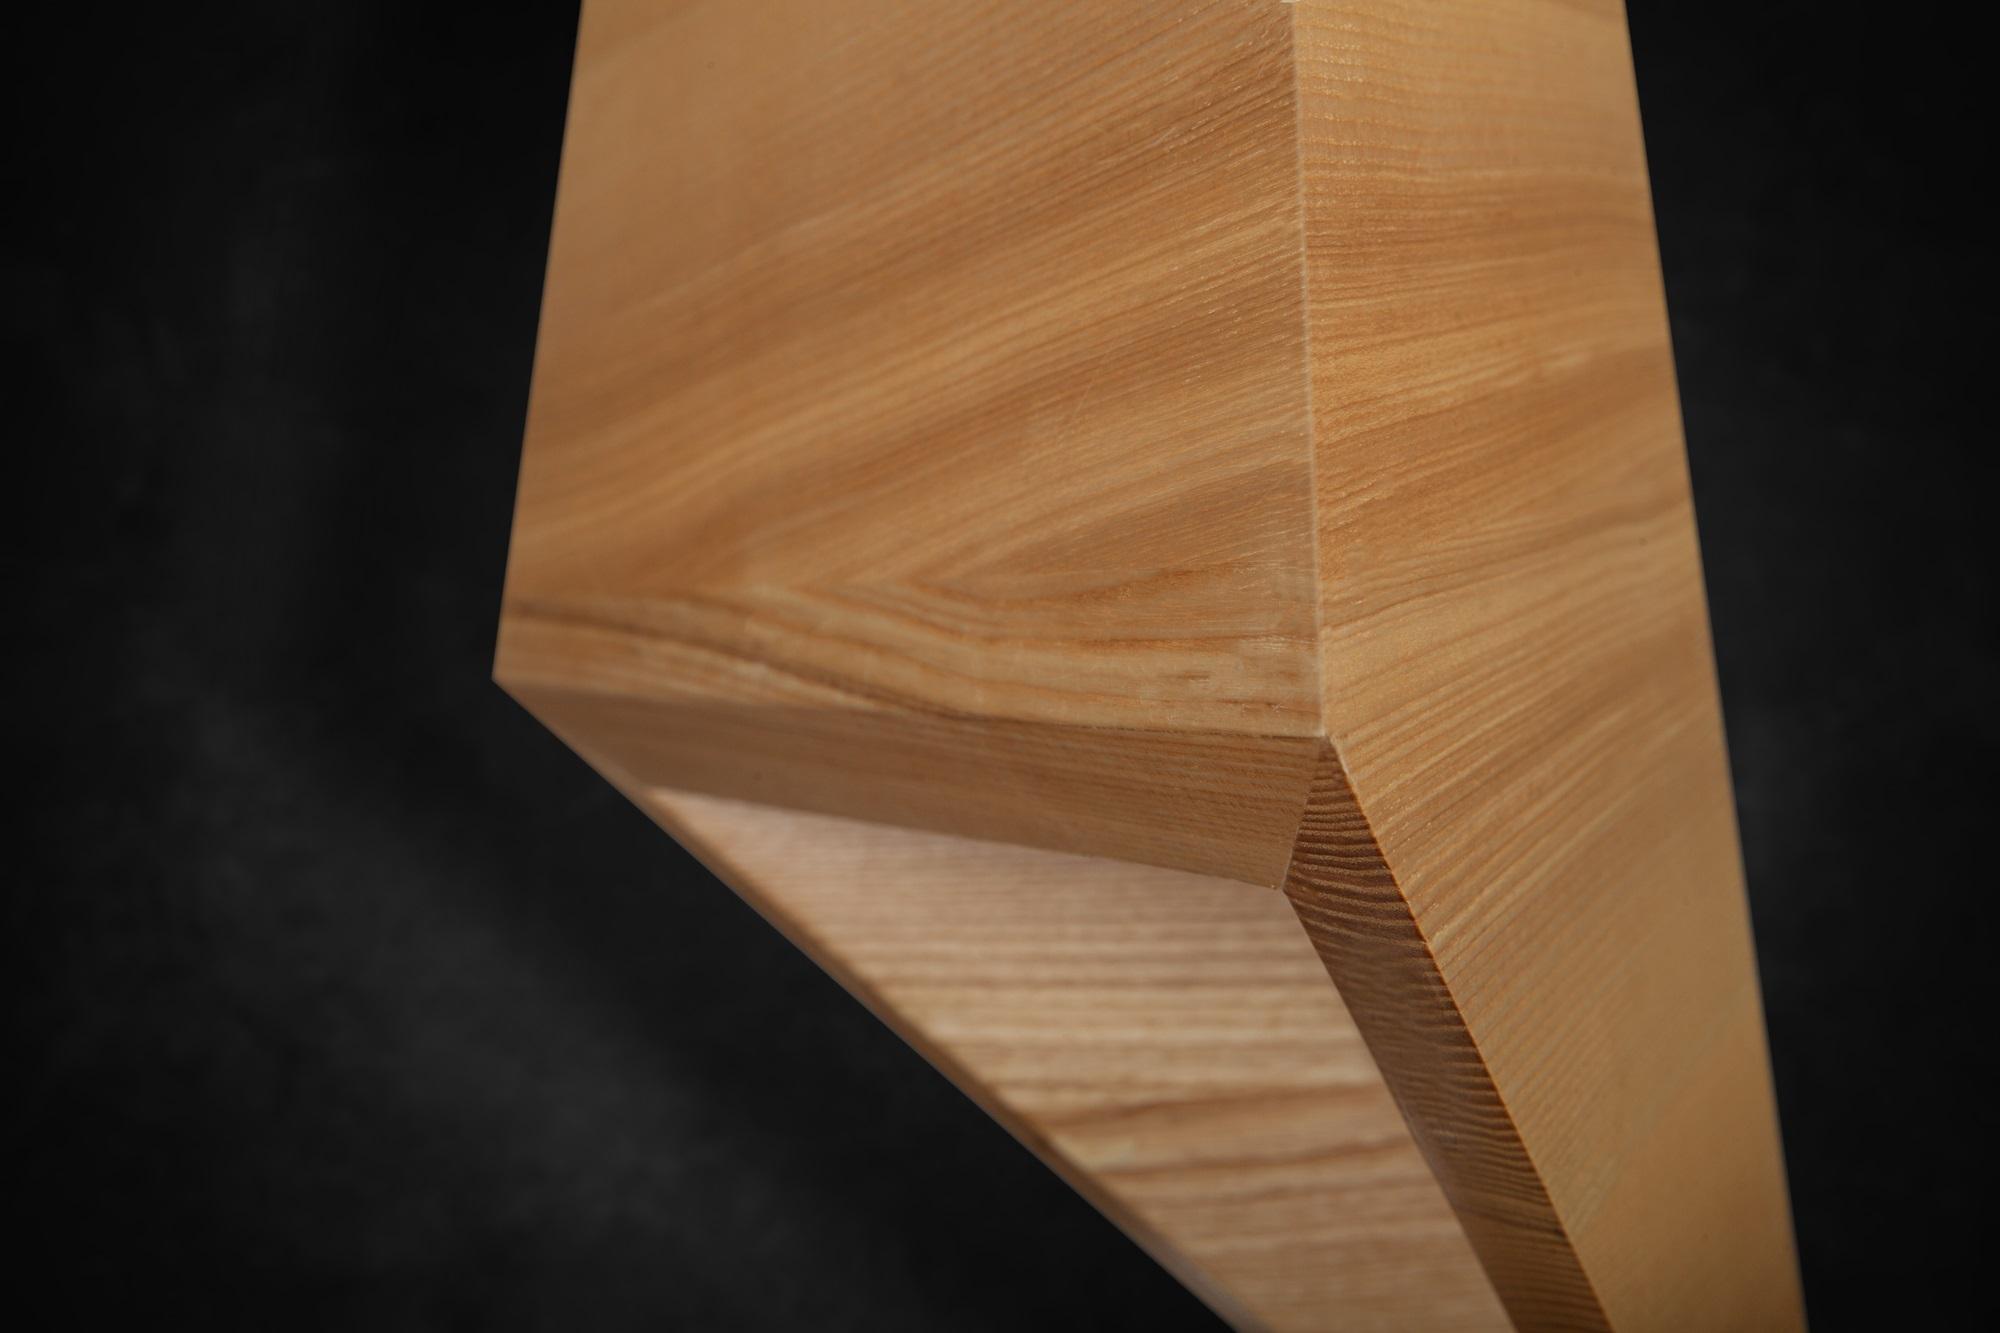 skeld-design-sharp-ash-04.jpg